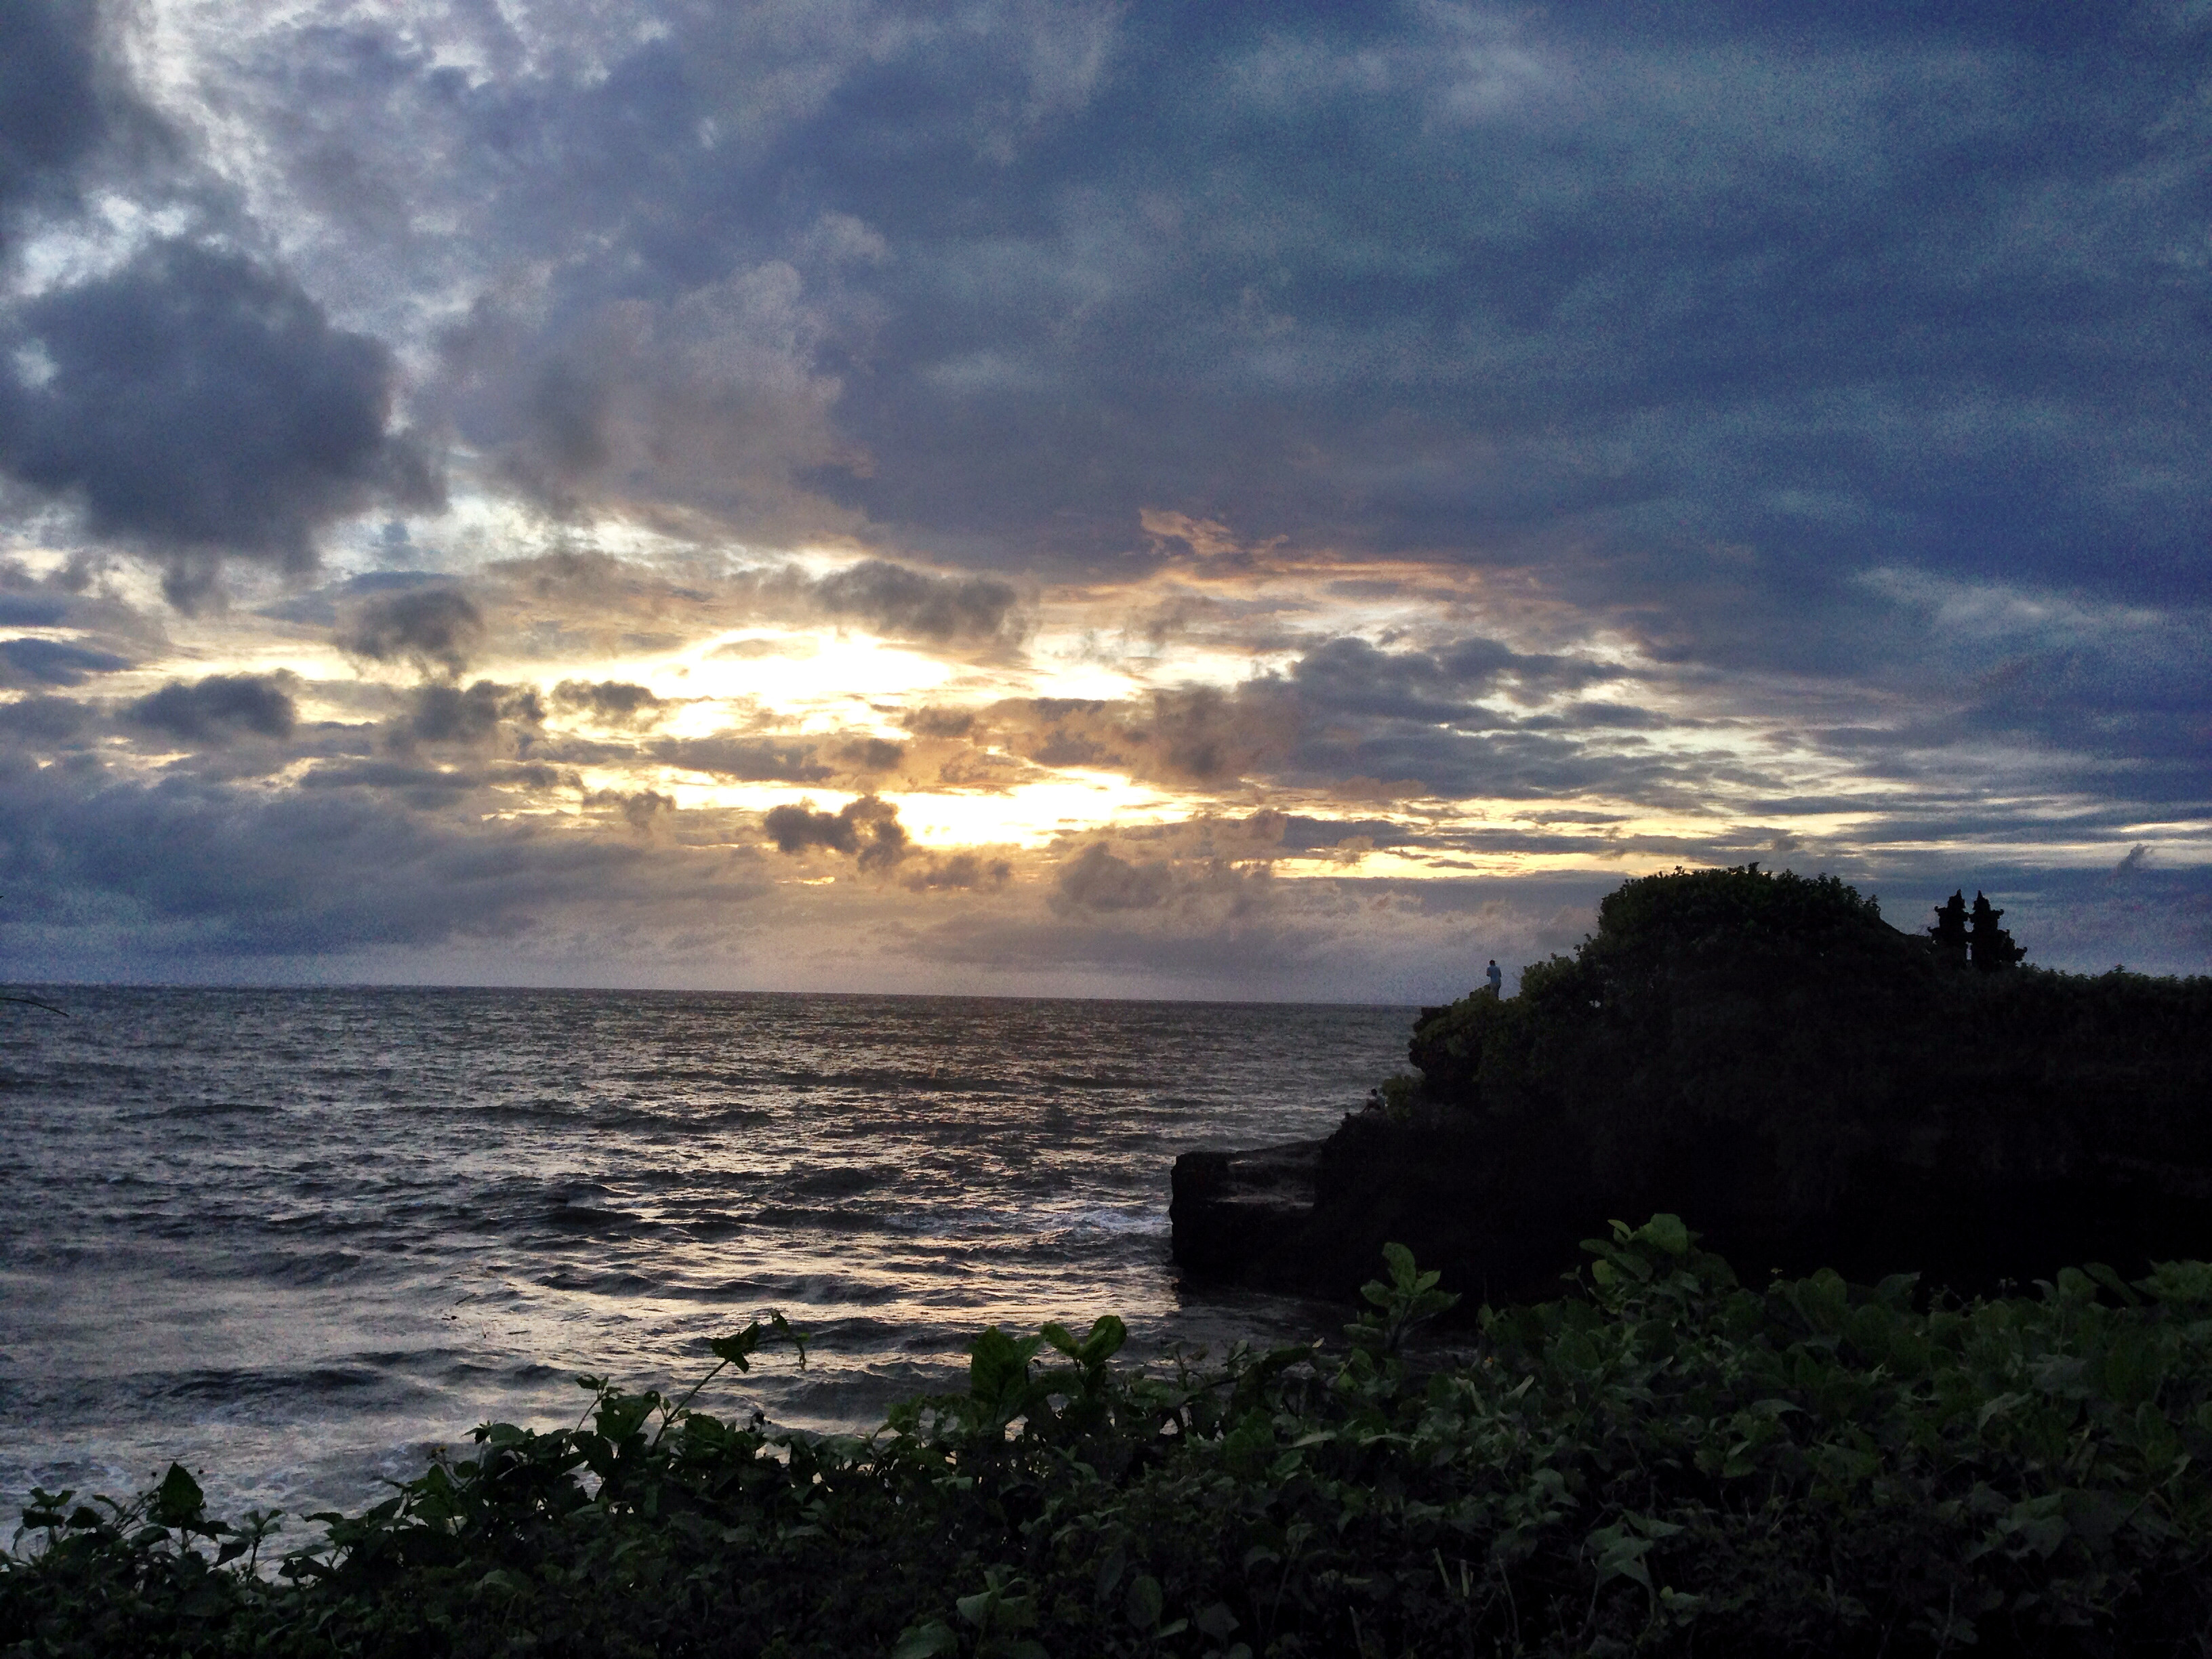 Bali Kuta Weather Forecast 10 Days